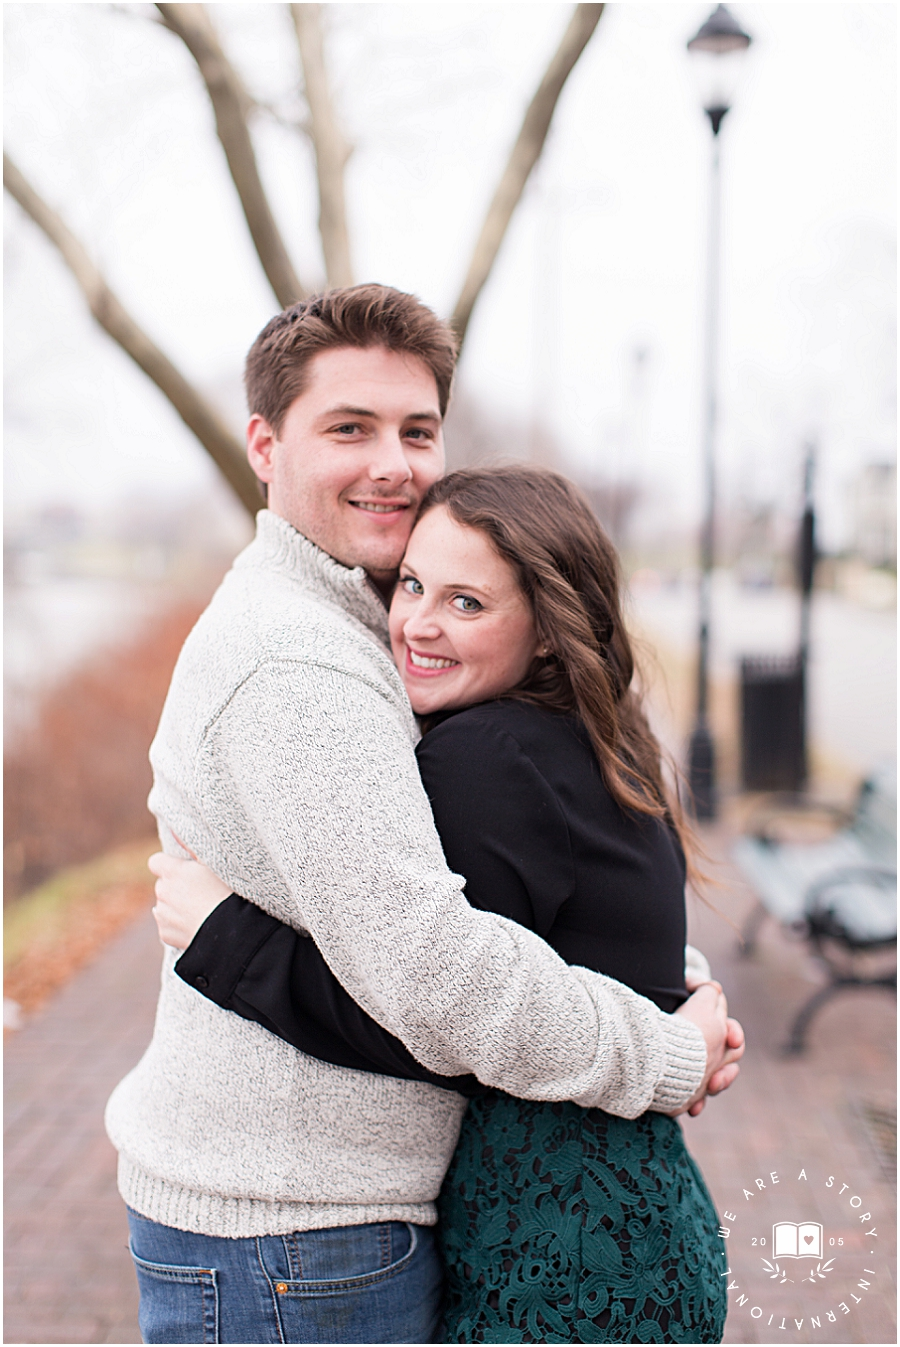 Cincinnati Wedding Photographer_We Are A Story_Molly & Matt Engagement Session_2545.jpg